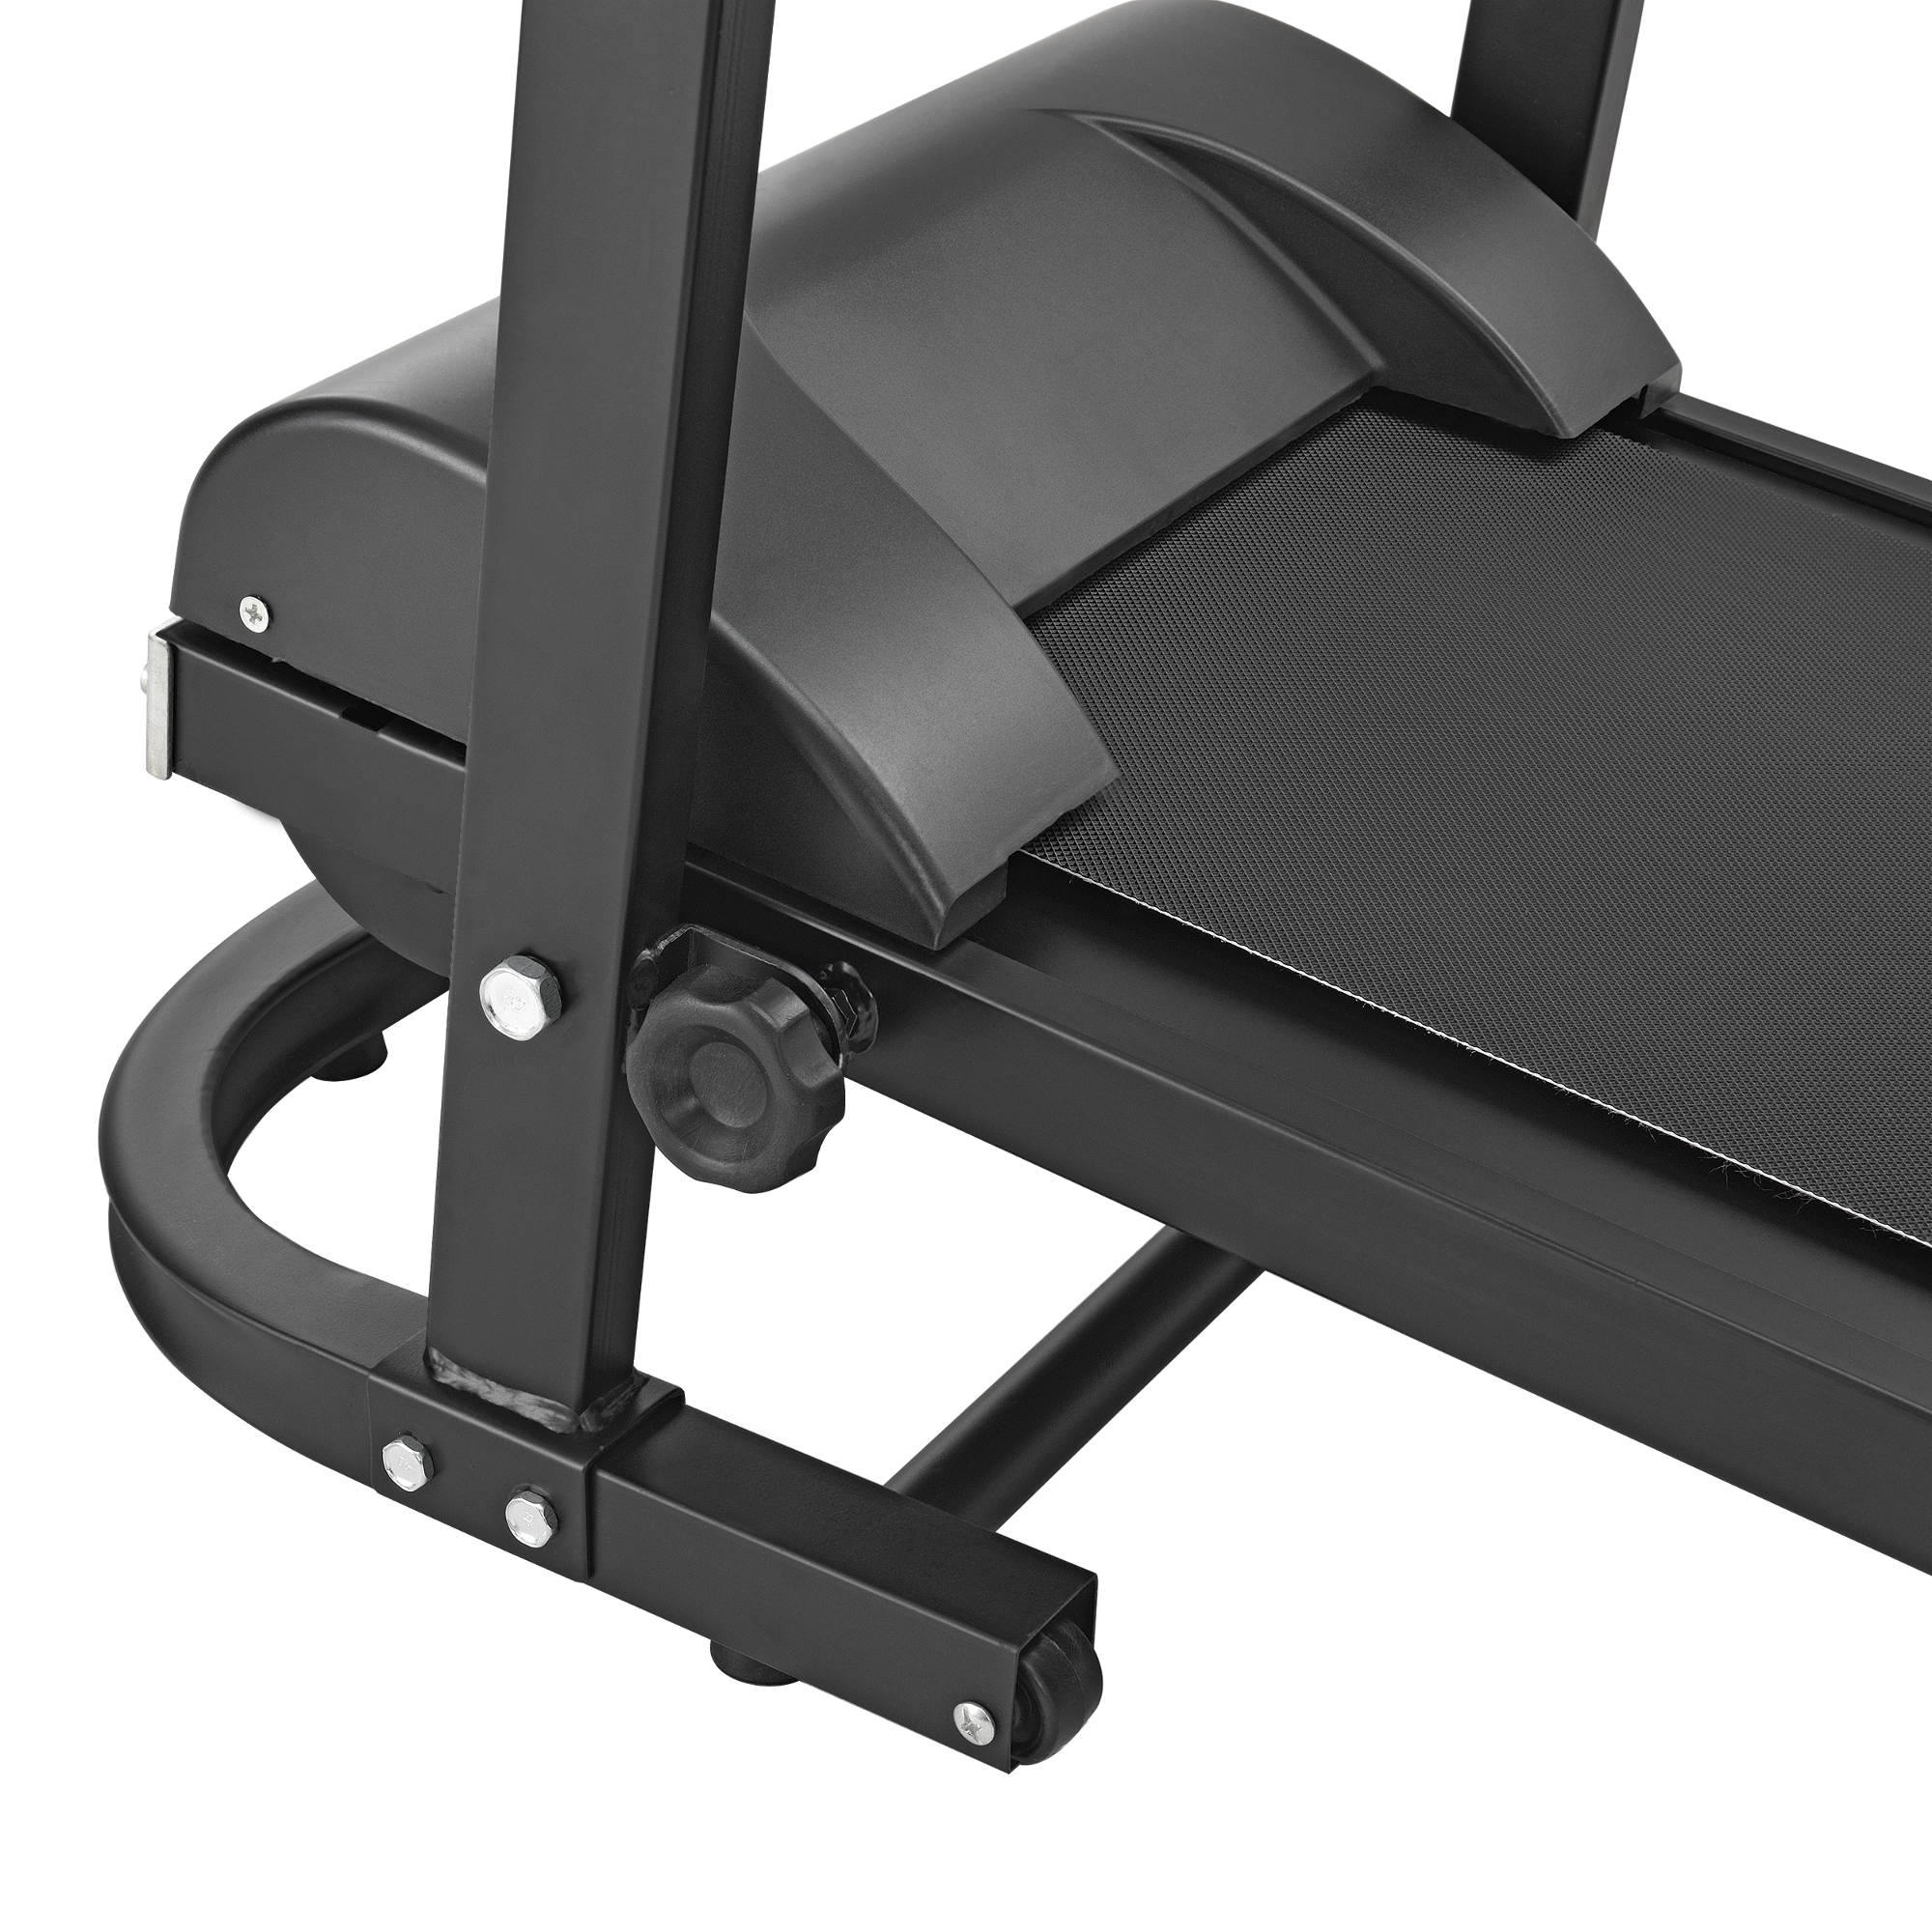 mechanisches laufband mit lcd display fitnessger t klappbar heimtrainer ebay. Black Bedroom Furniture Sets. Home Design Ideas